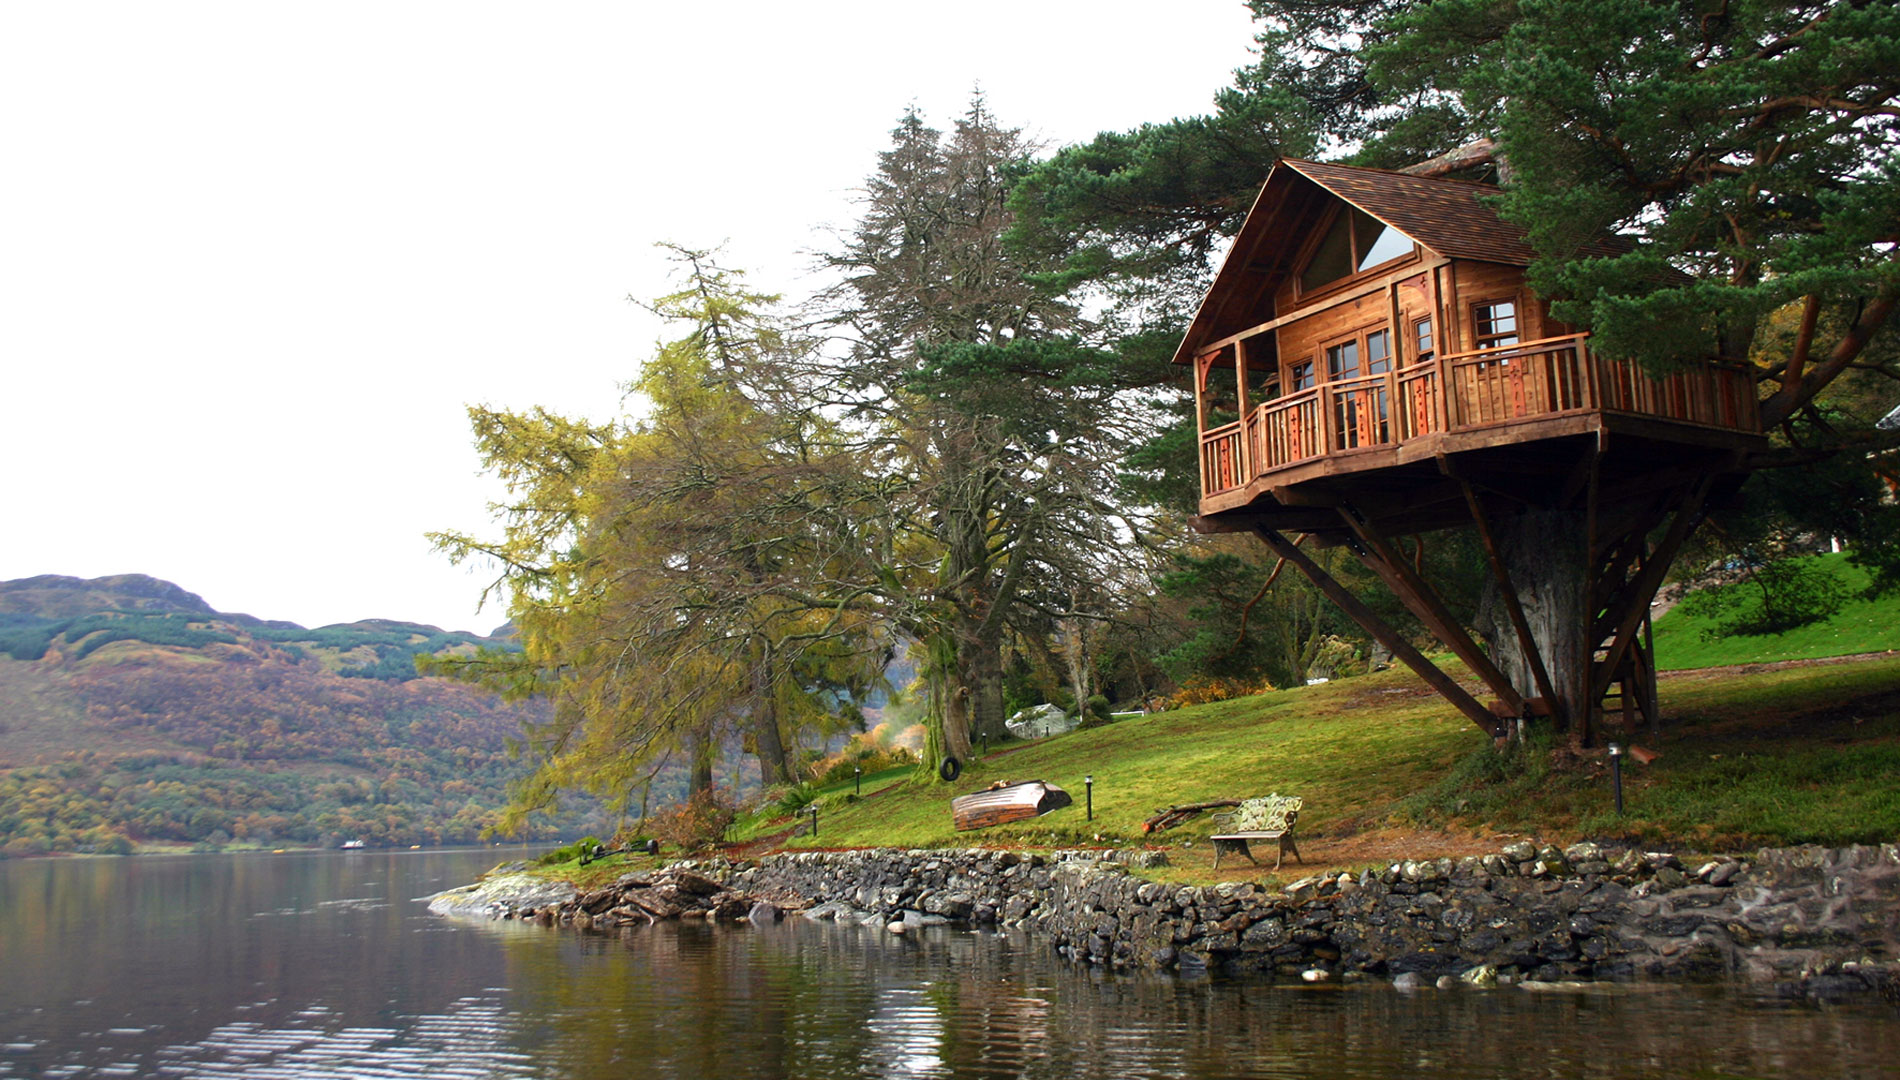 The Lodge on Loch Goil, Scotland